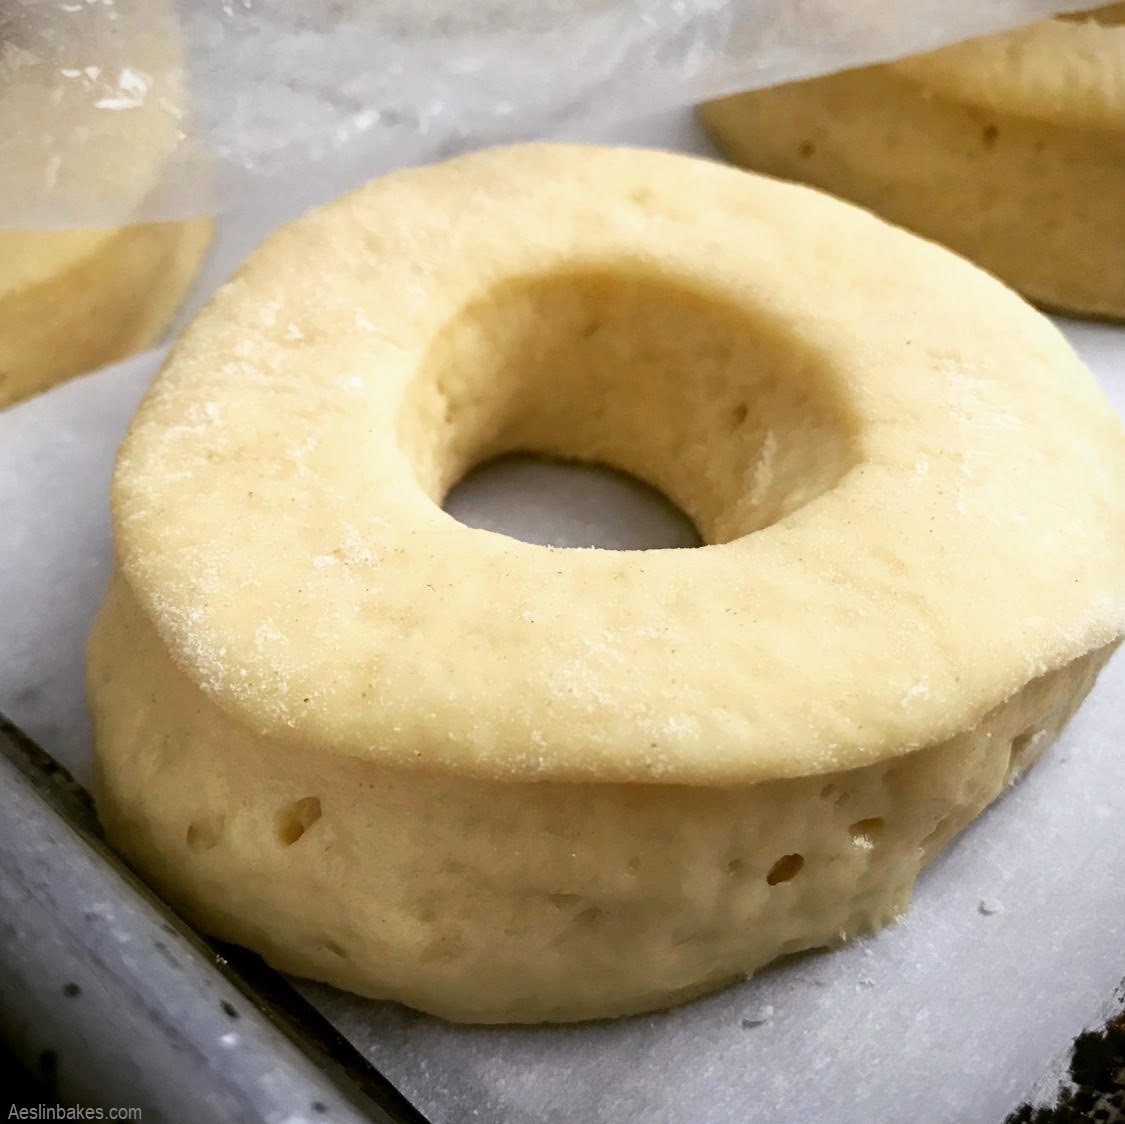 proofed doughnut